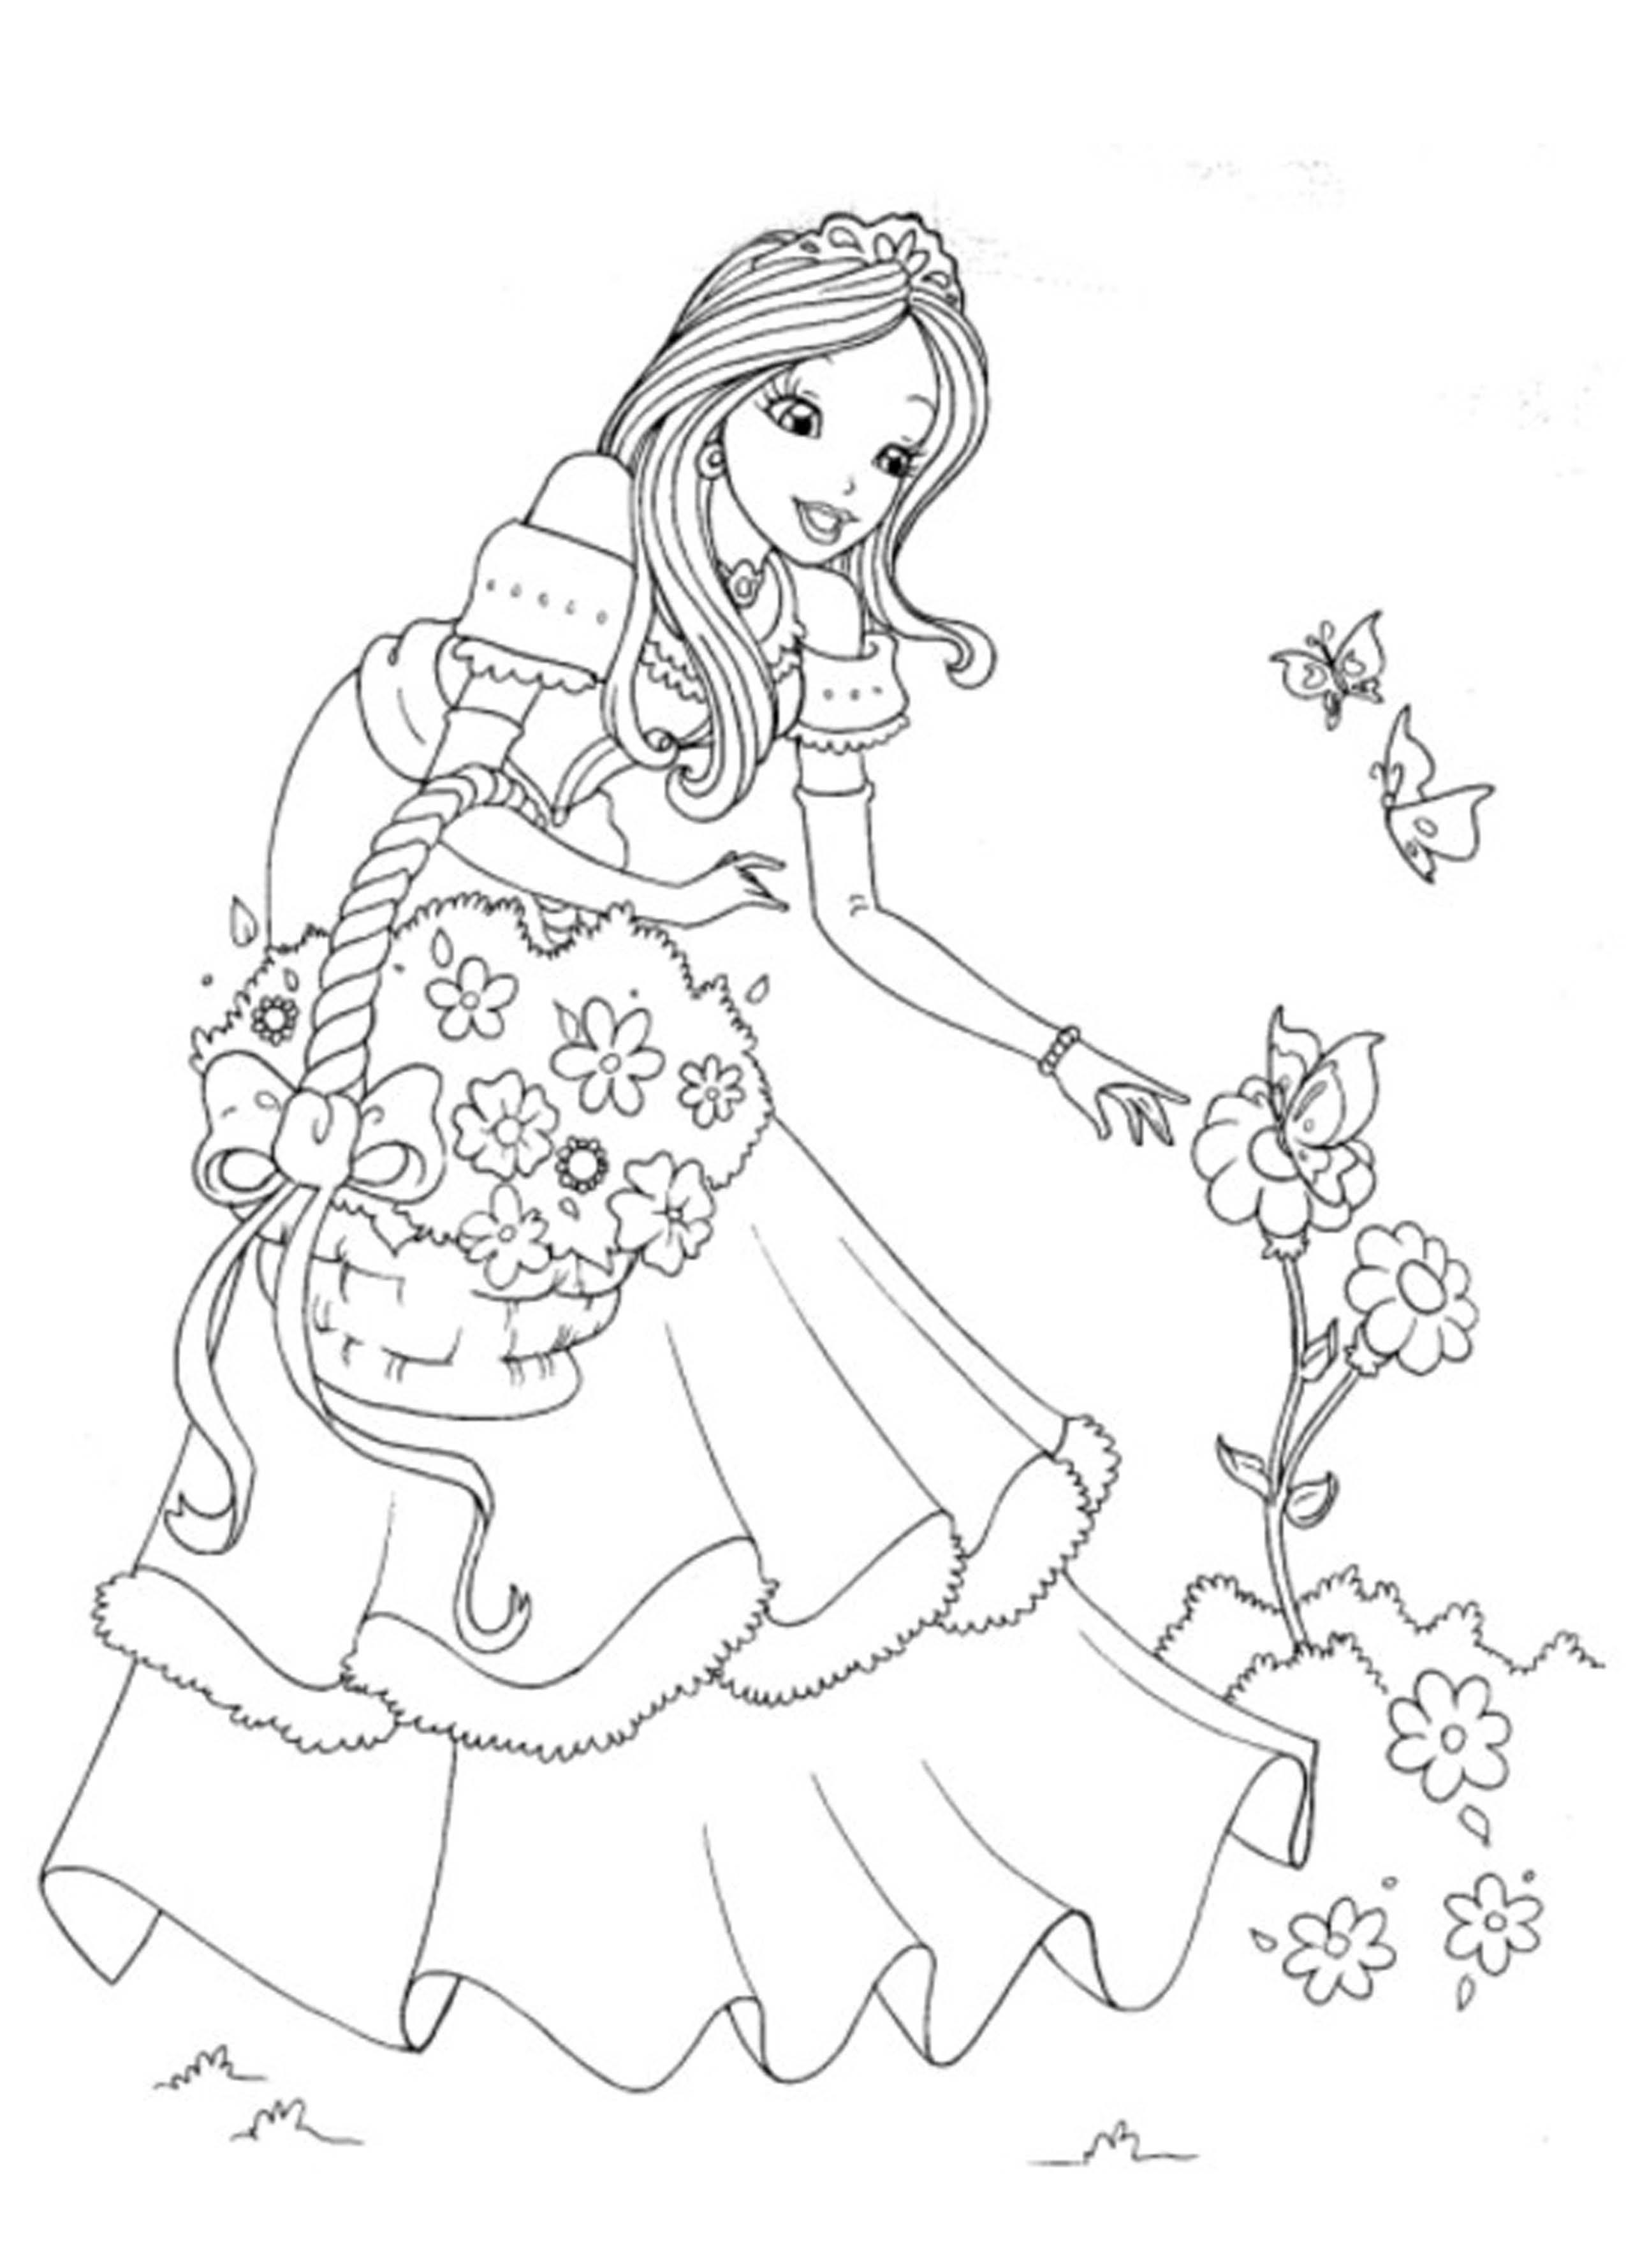 Disney princess coloring pages to print - Disney Princess Coloring Pages Printable Printable Kids